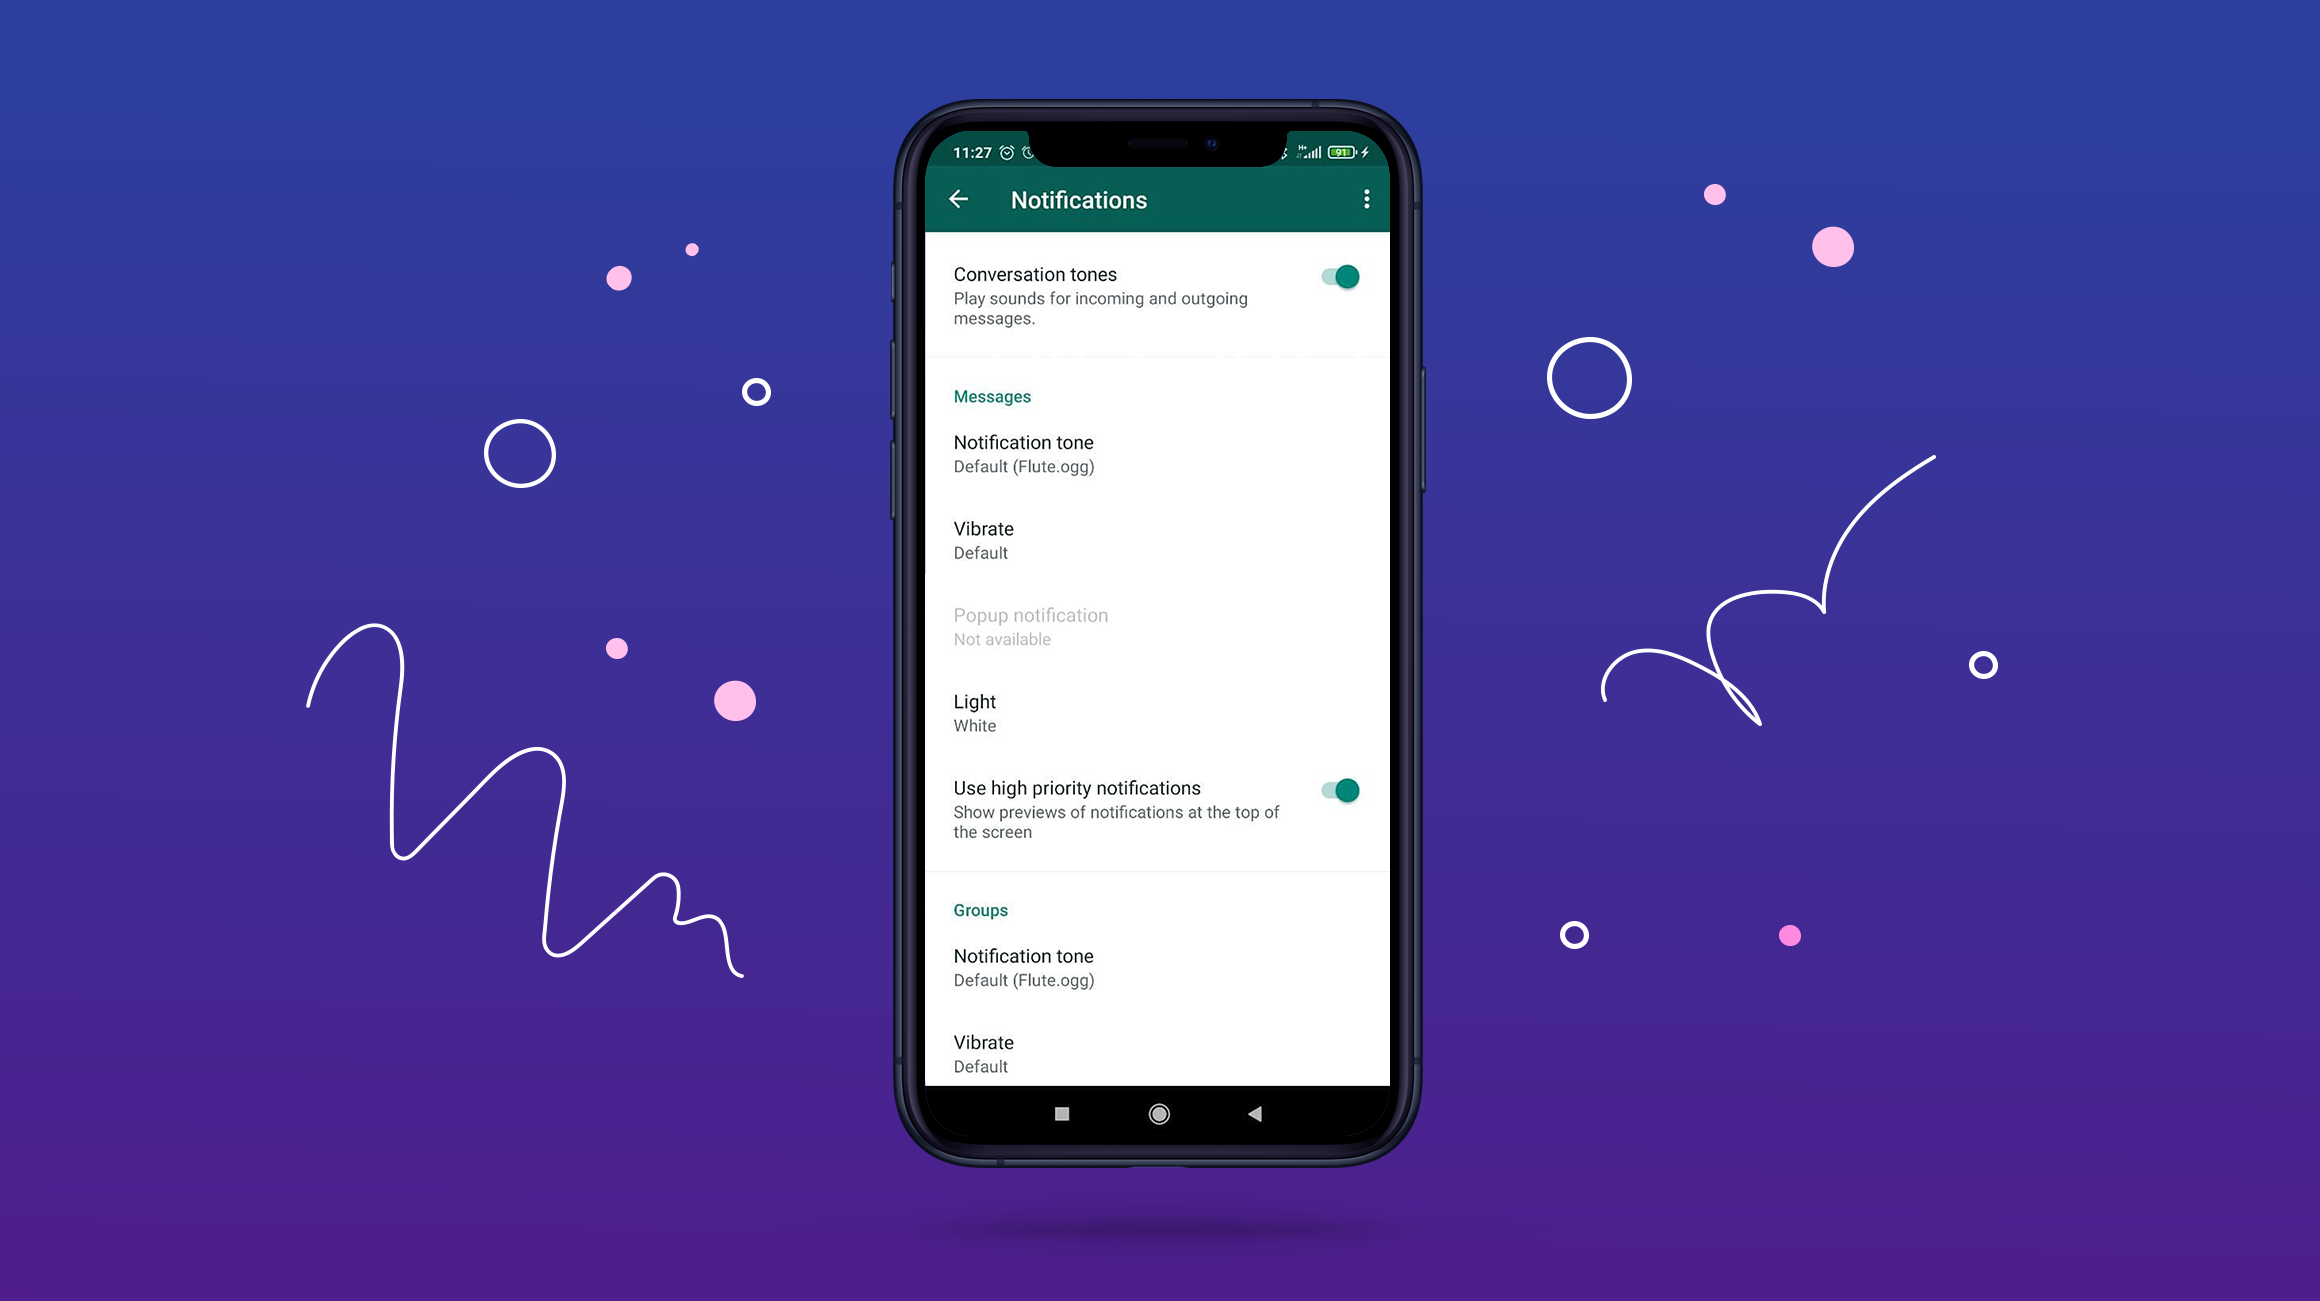 WhatsApp notifications settings